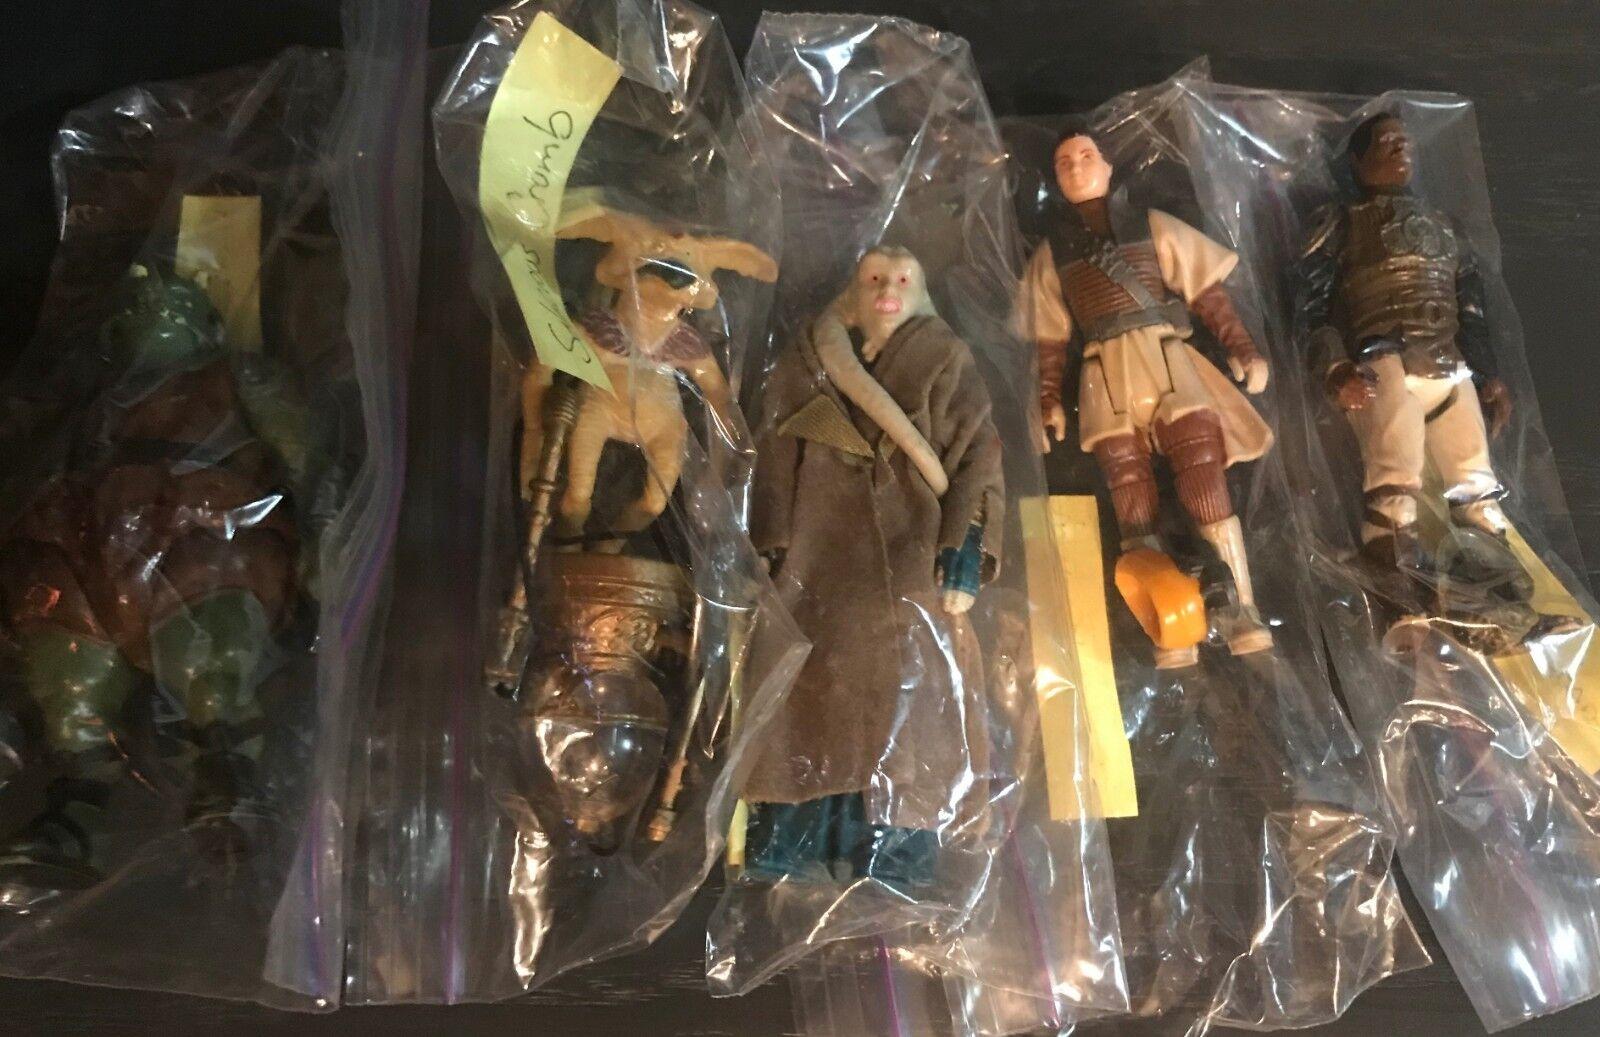 Star Wars Vintage Set of FIVE (5) Action Figures from Tatooine Scenes